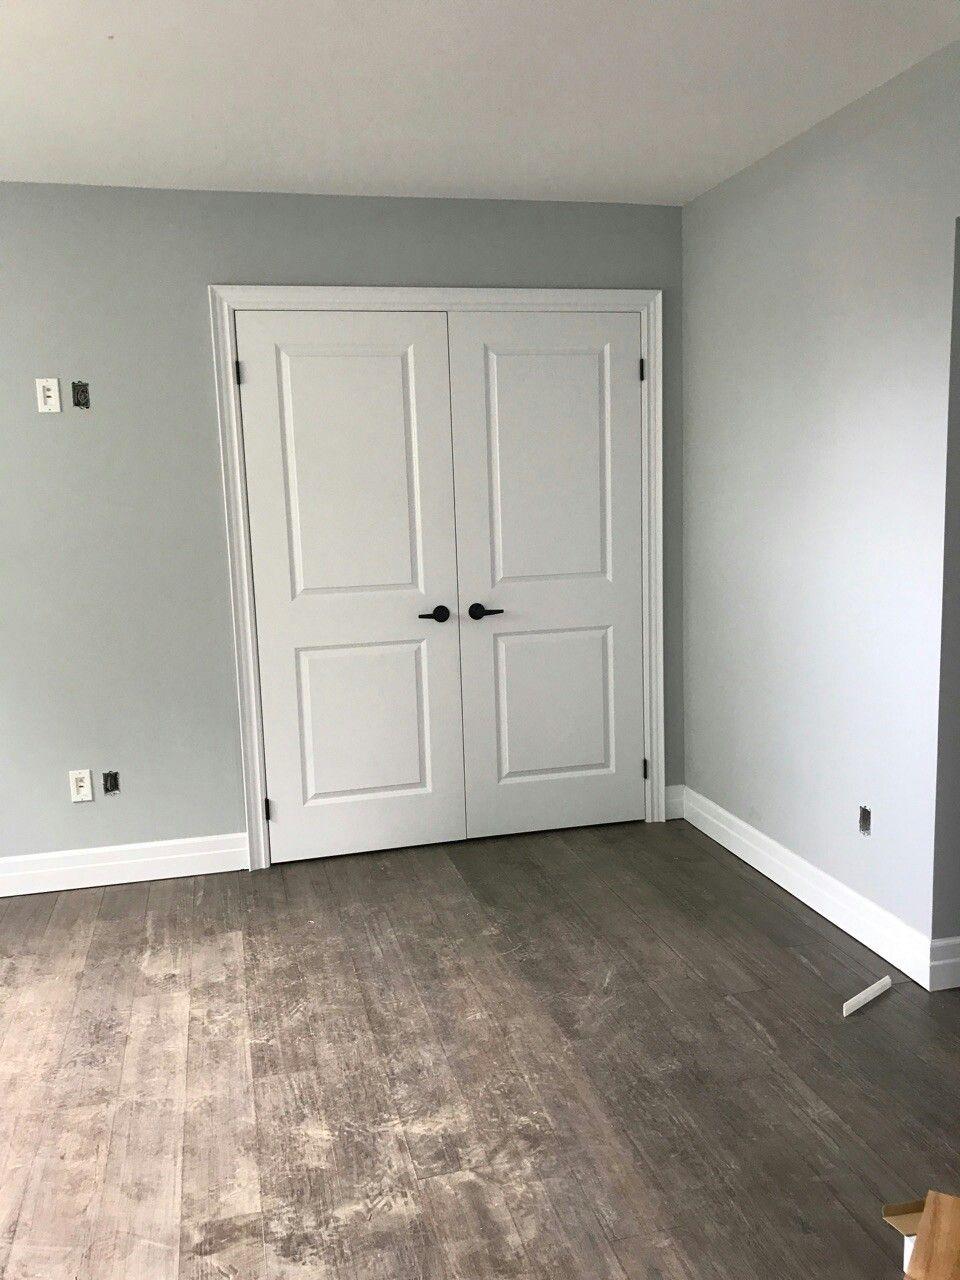 Master Bedroom Reno Walls Whitestone Benjamin Moore Is A Lovely Blue Gray Floors Oak Lava 10mm Laminate Pla Grey Walls Grey Laminate Flooring White Doors